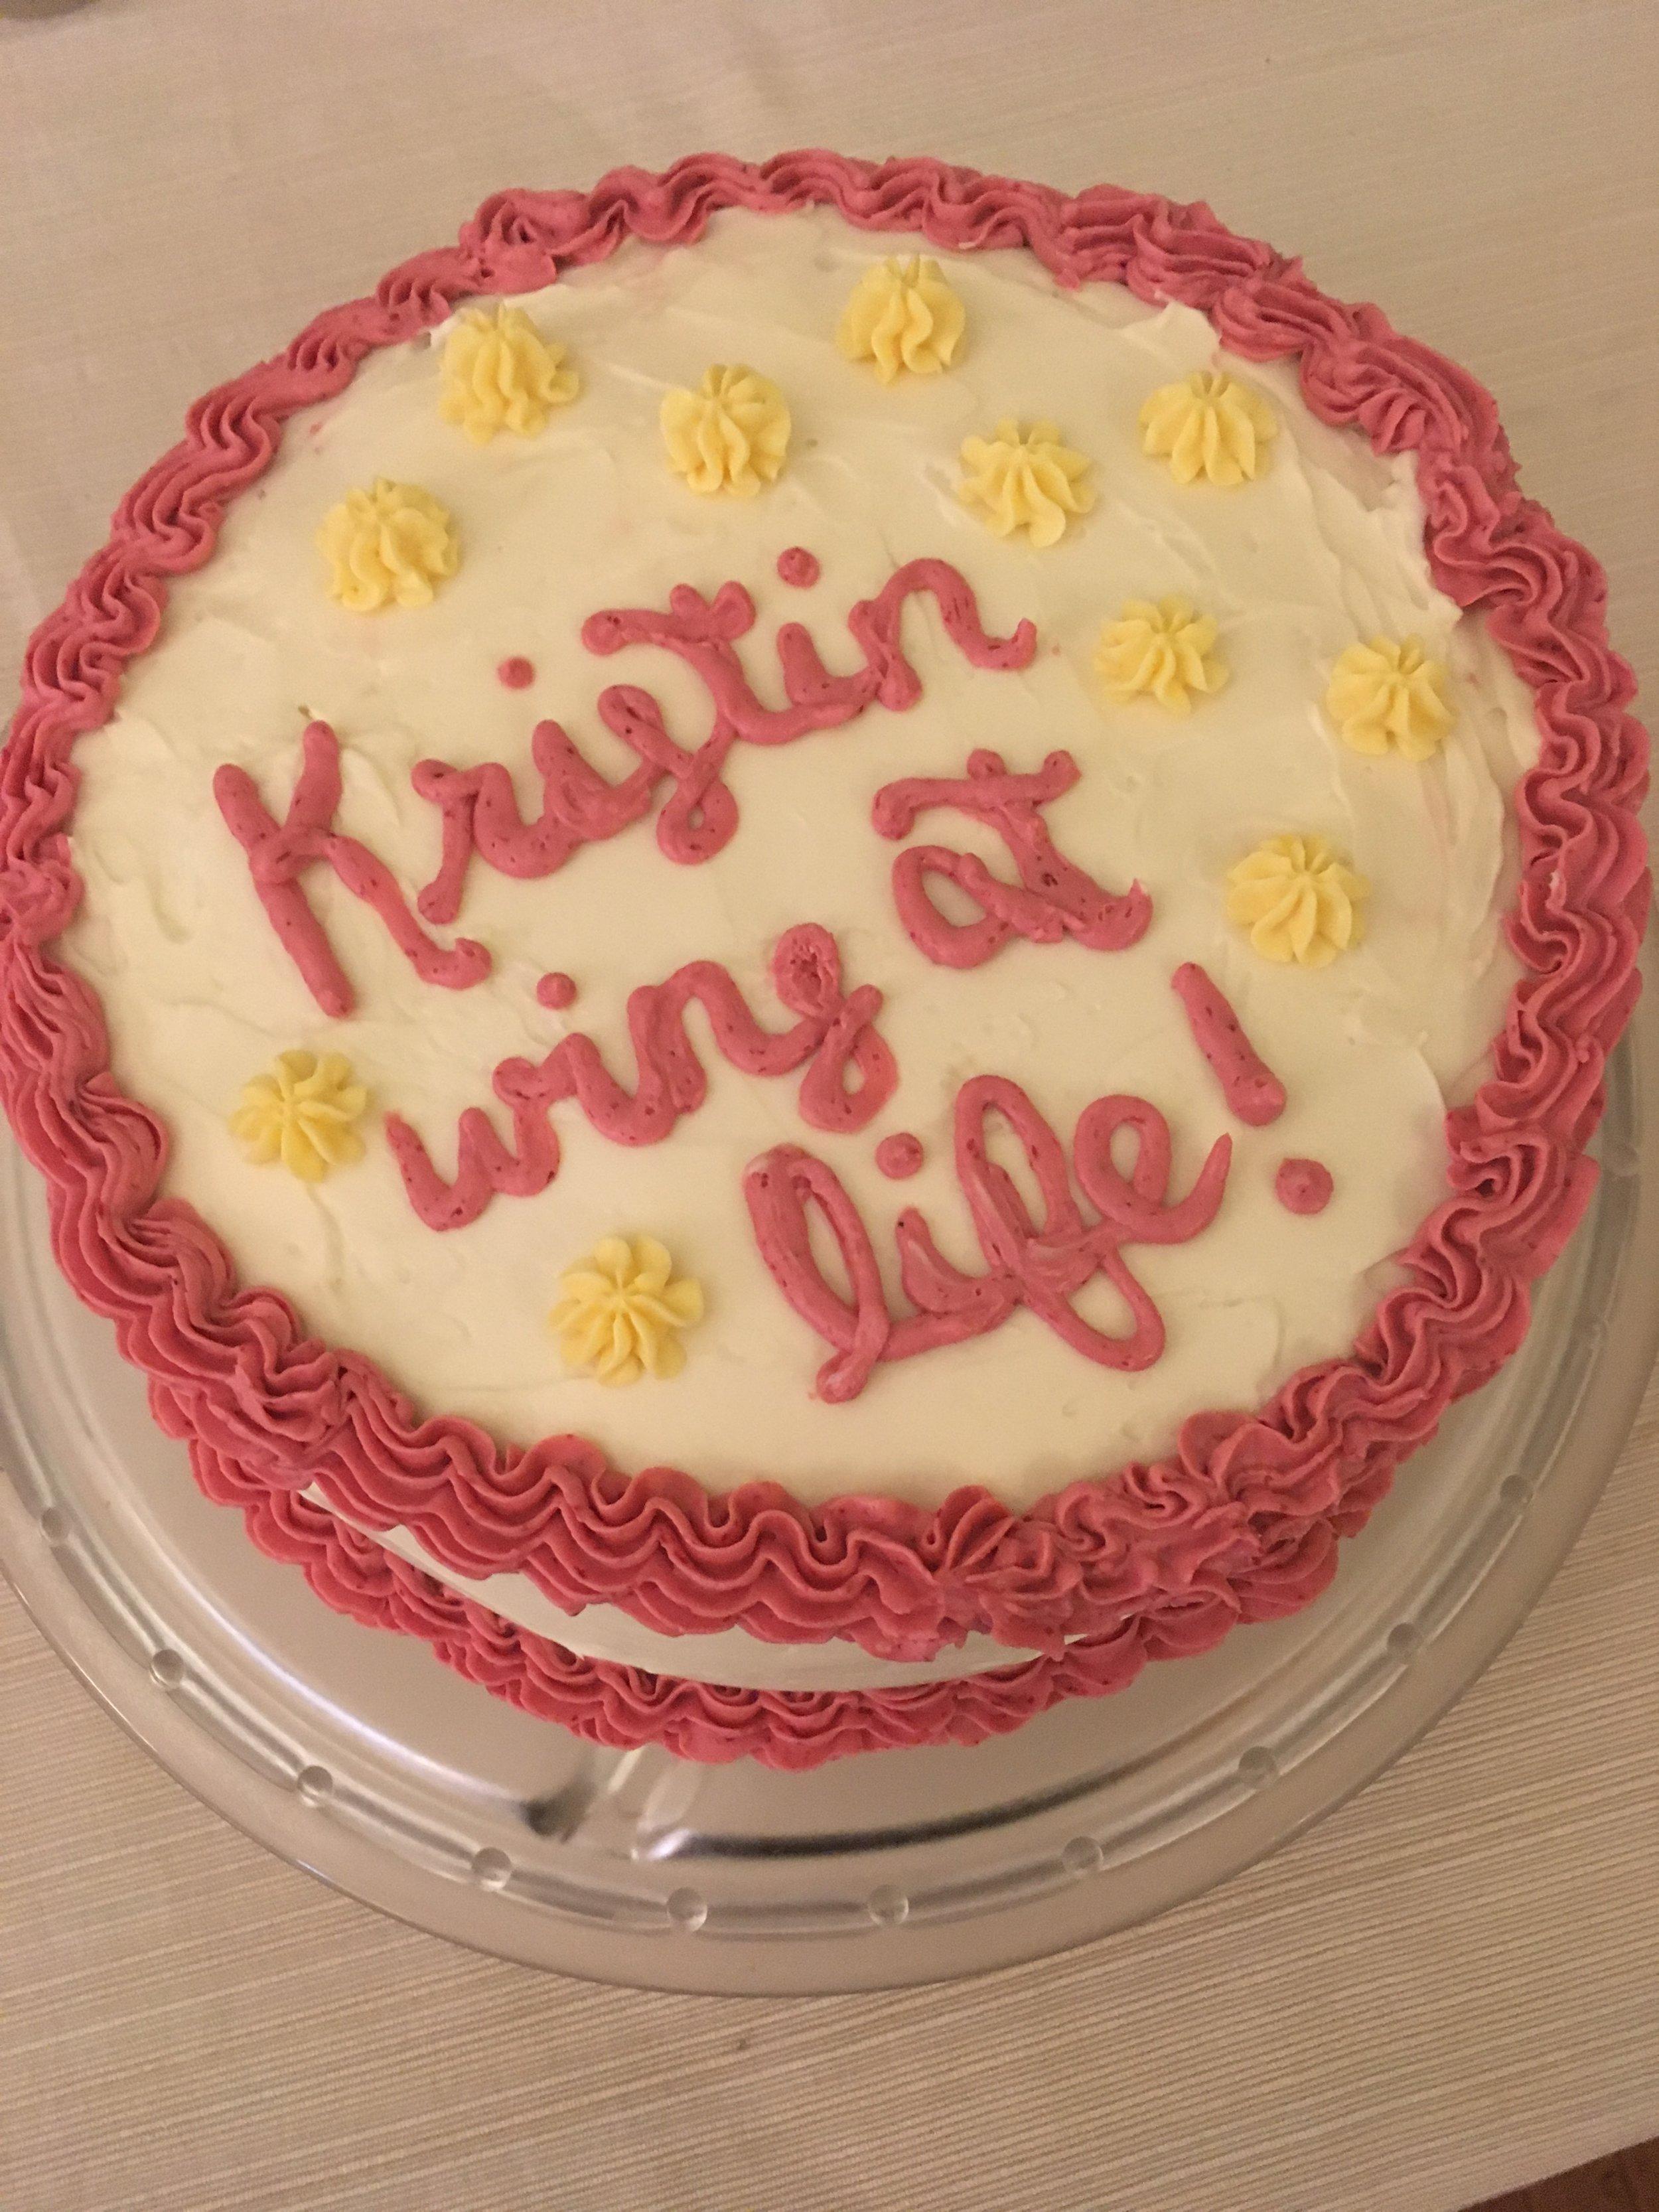 Kristin Wins at Life!